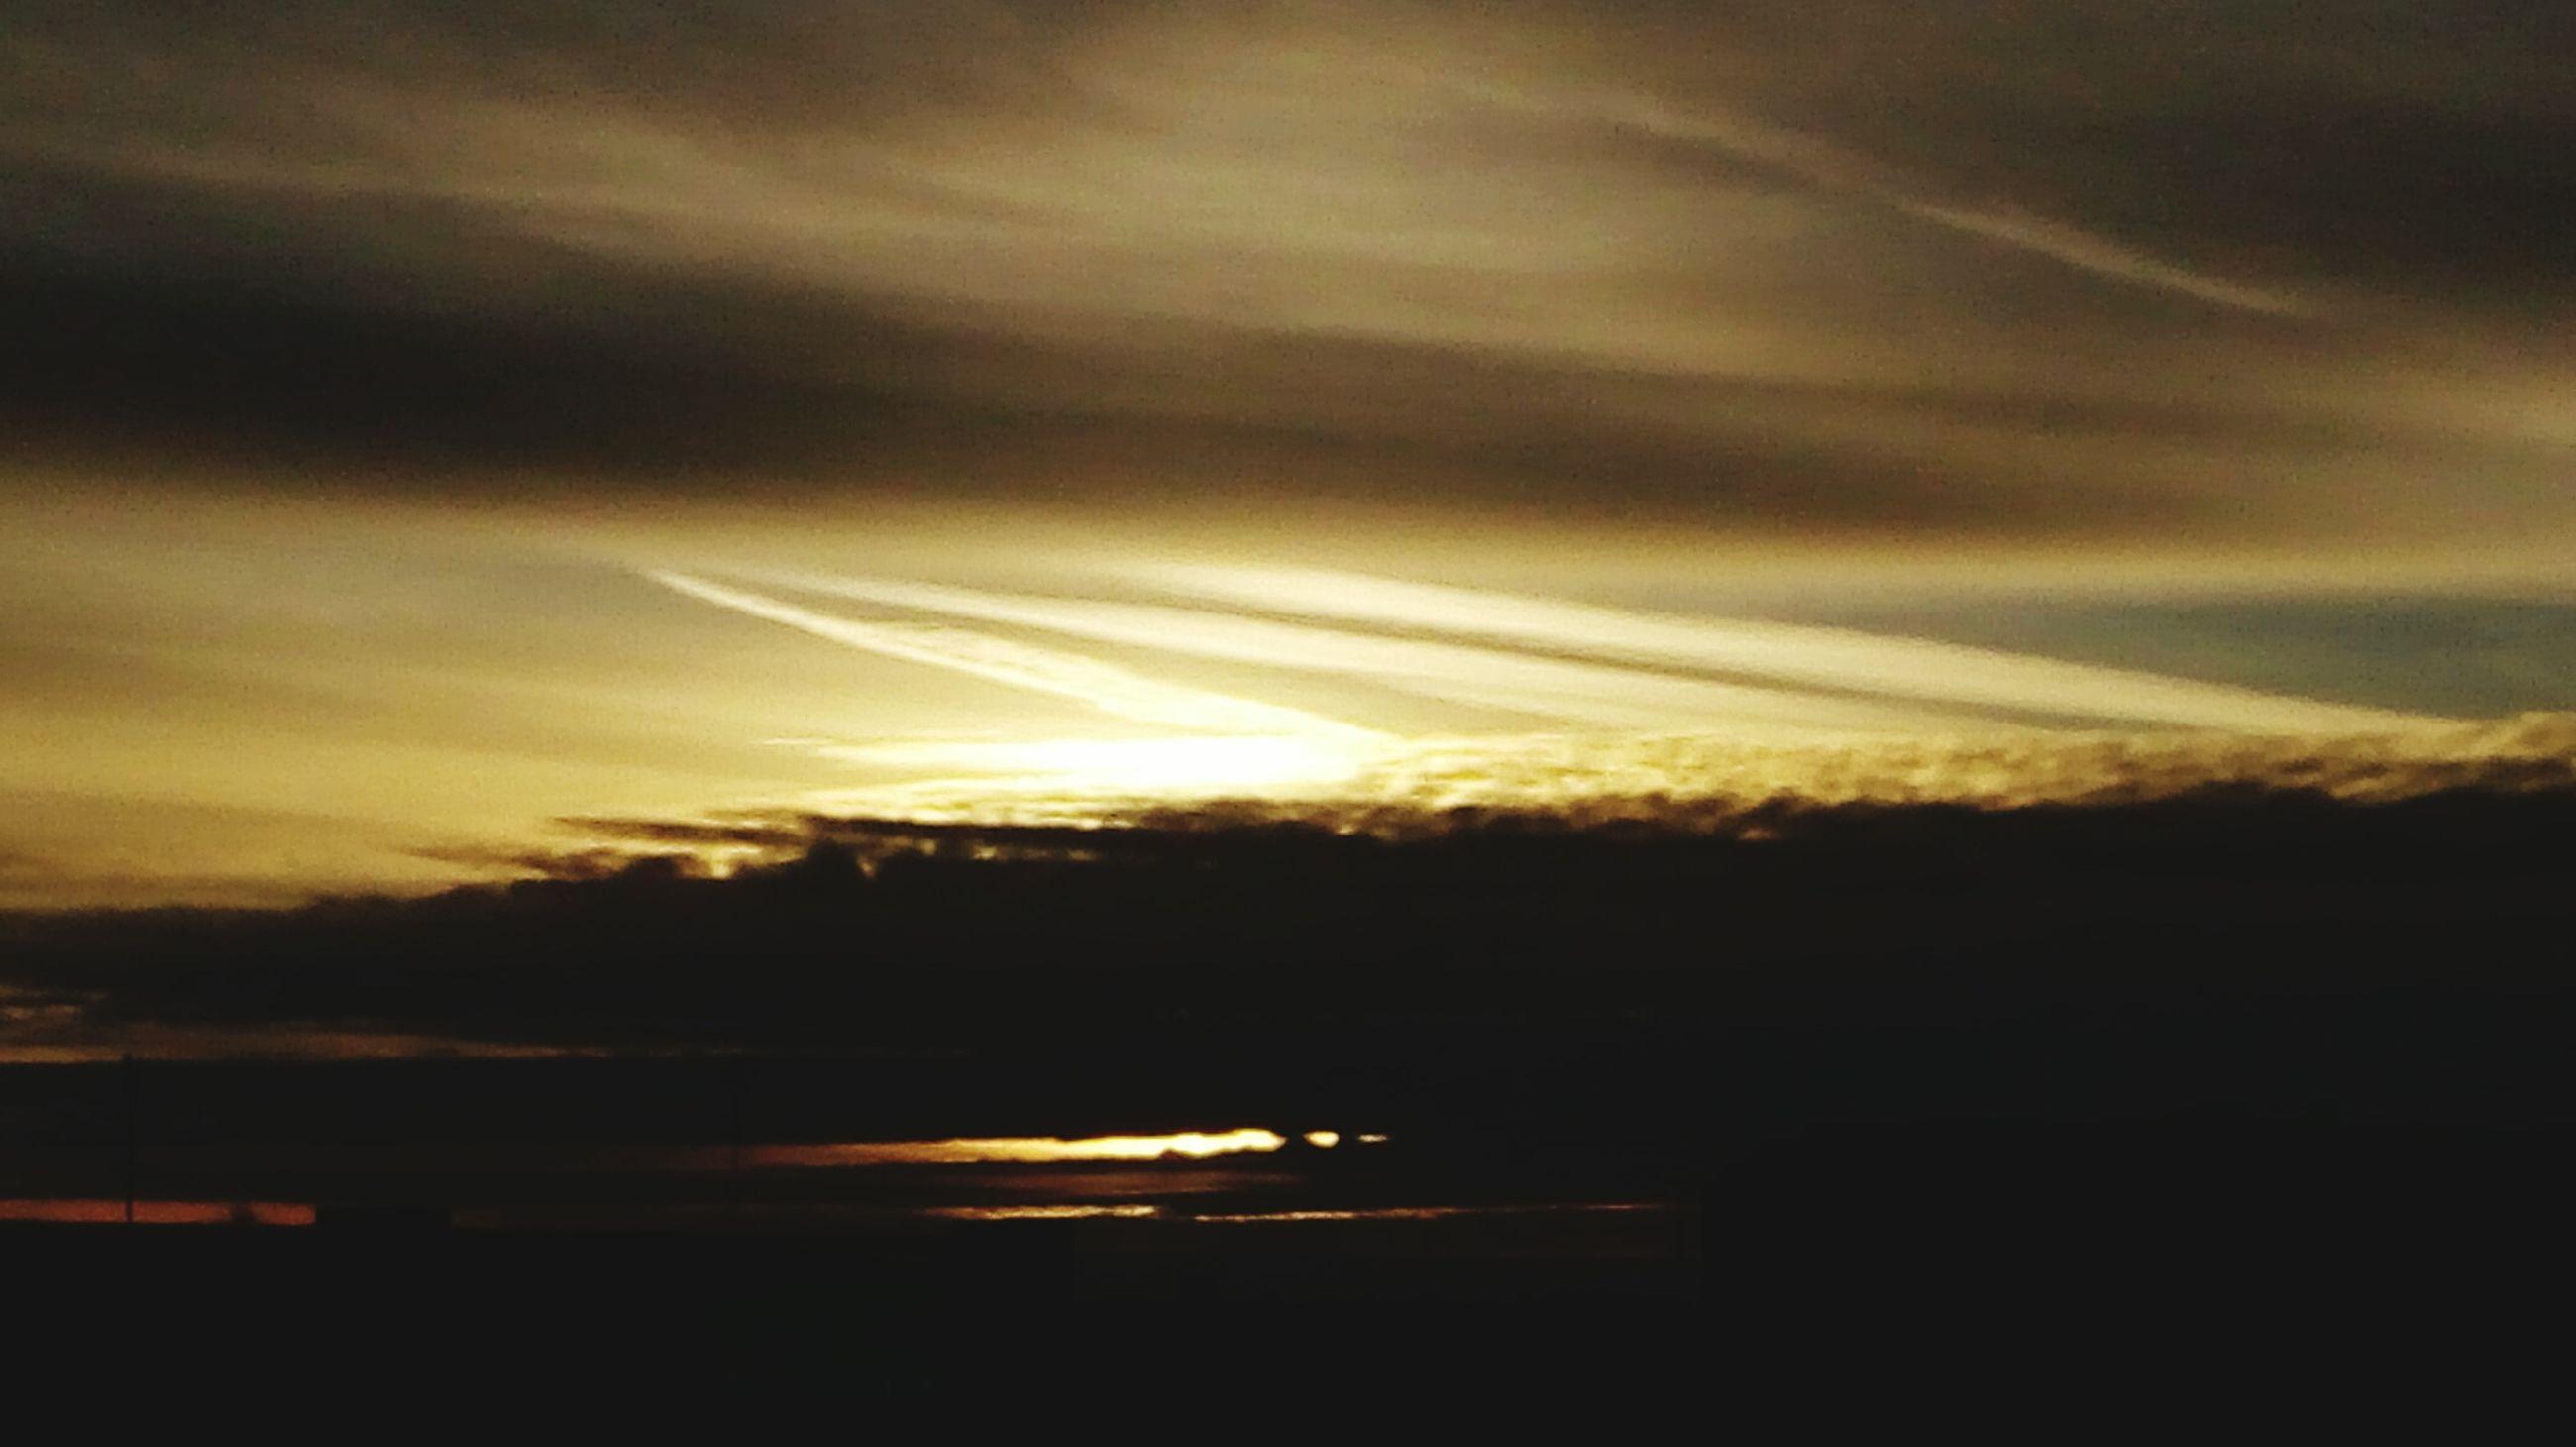 sunset, silhouette, sky, cloud - sky, scenics, beauty in nature, tranquil scene, tranquility, orange color, nature, cloud, cloudy, idyllic, dramatic sky, dark, outdoors, landscape, sun, weather, moody sky